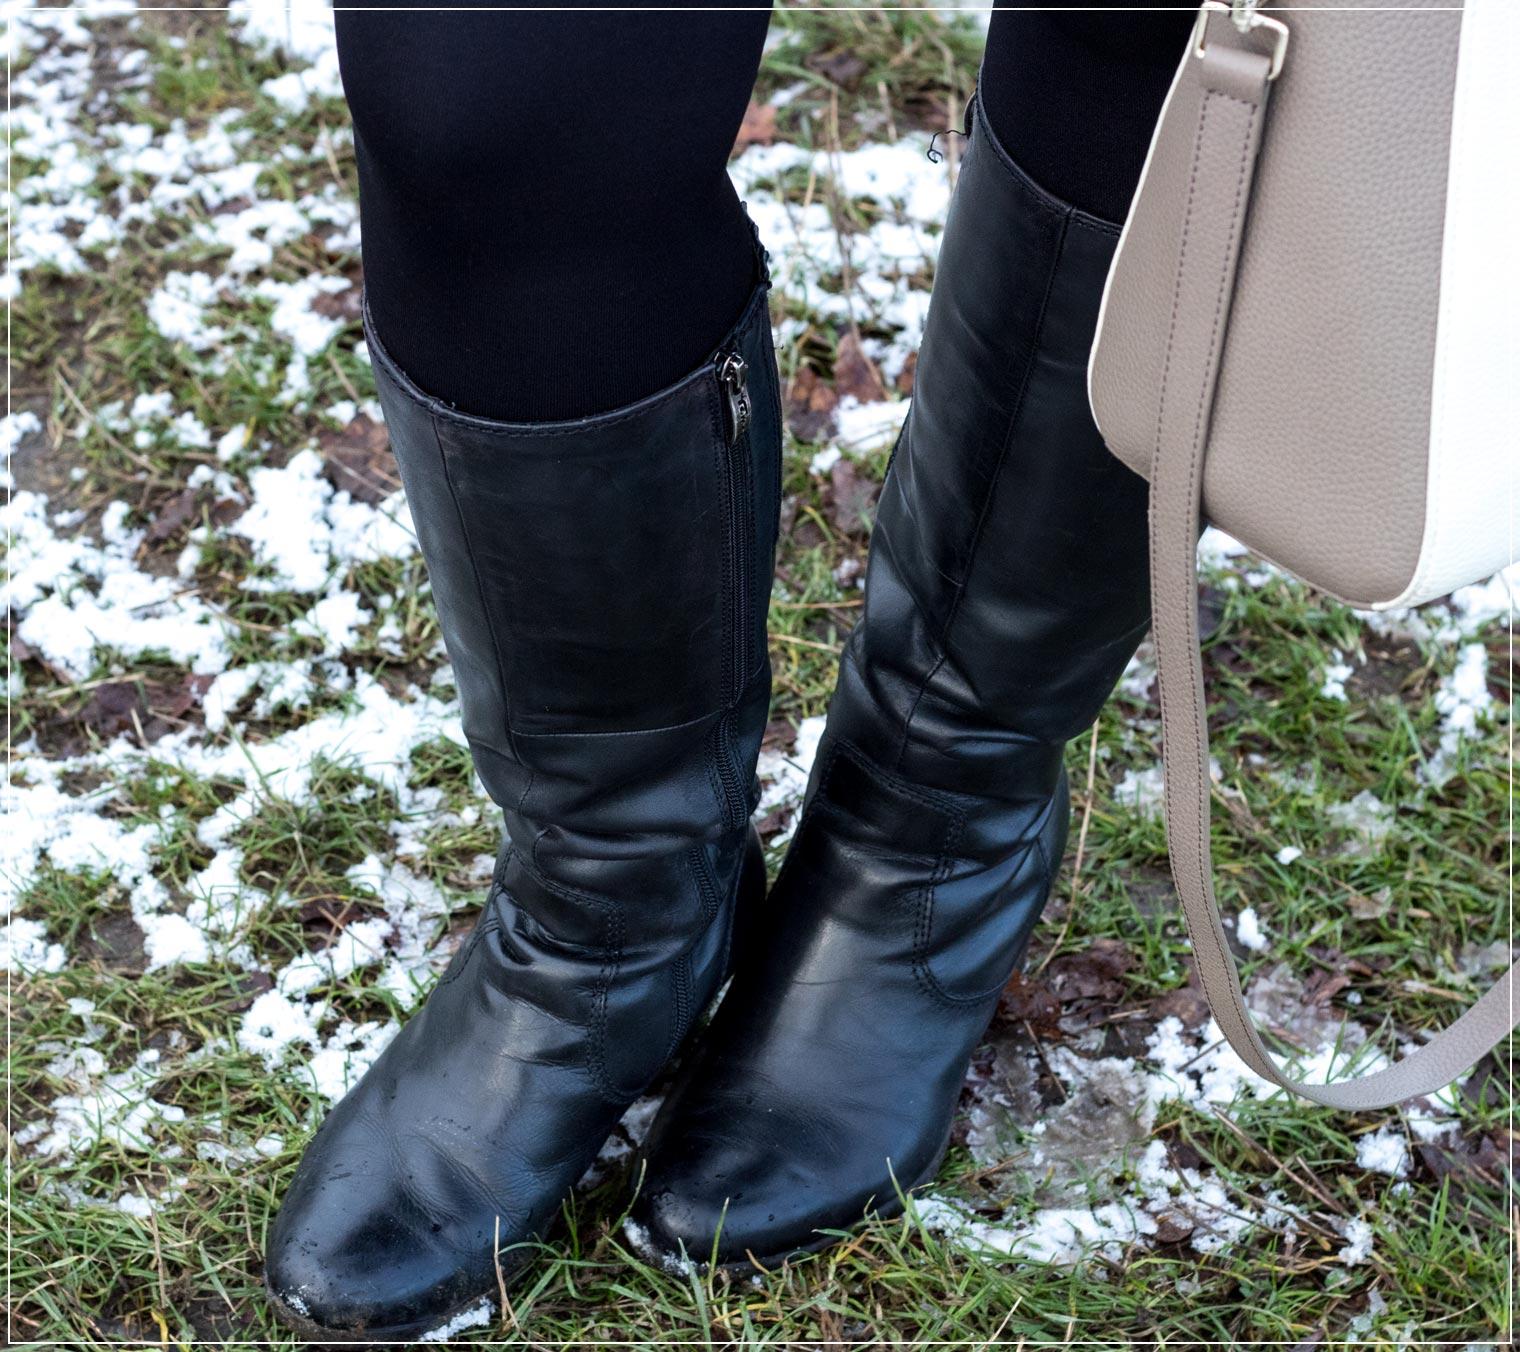 schwarzes Lederstiefel zum eleganten Winteroutfit